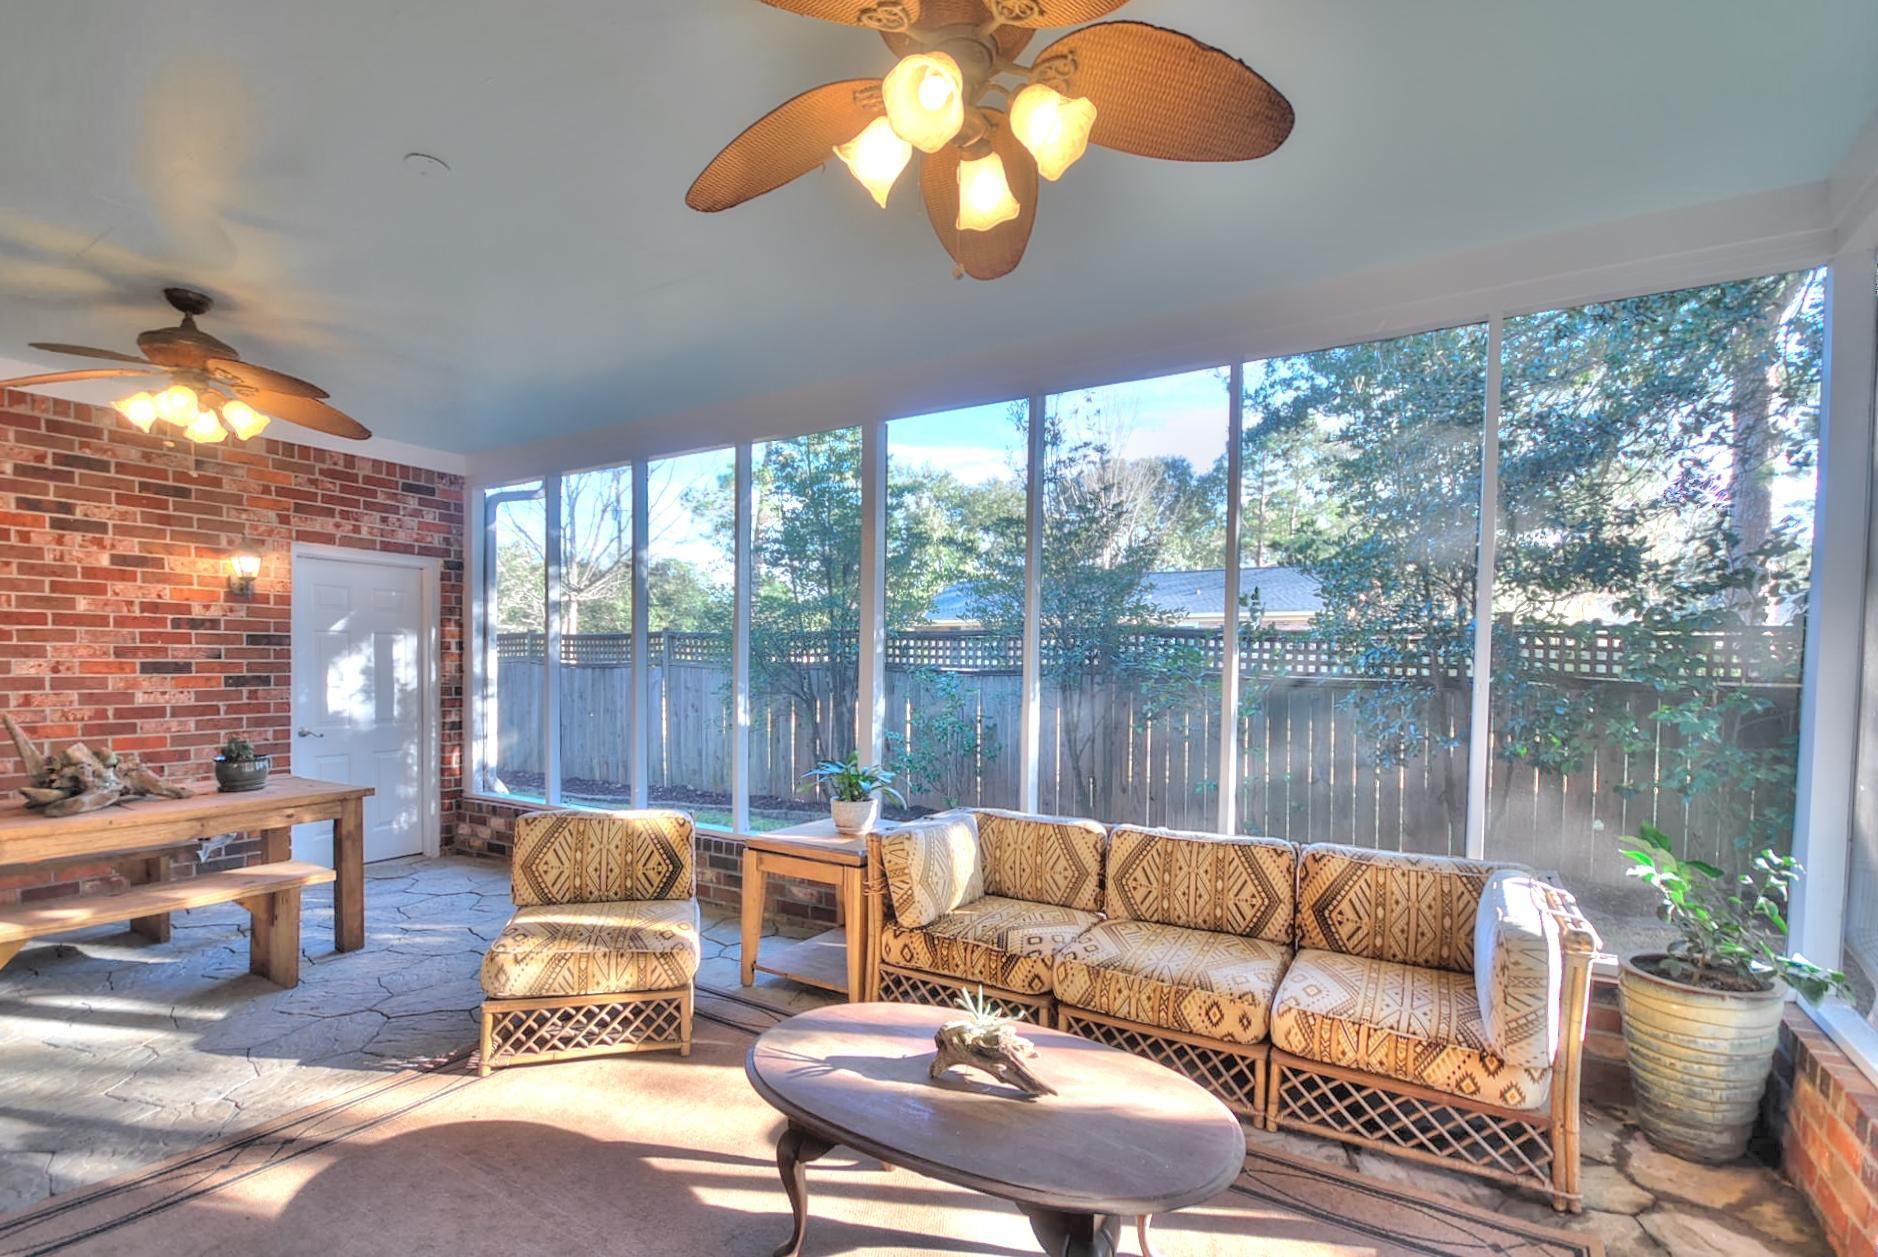 Capri Isles Homes For Sale - 213 Wappoo, Charleston, SC - 12